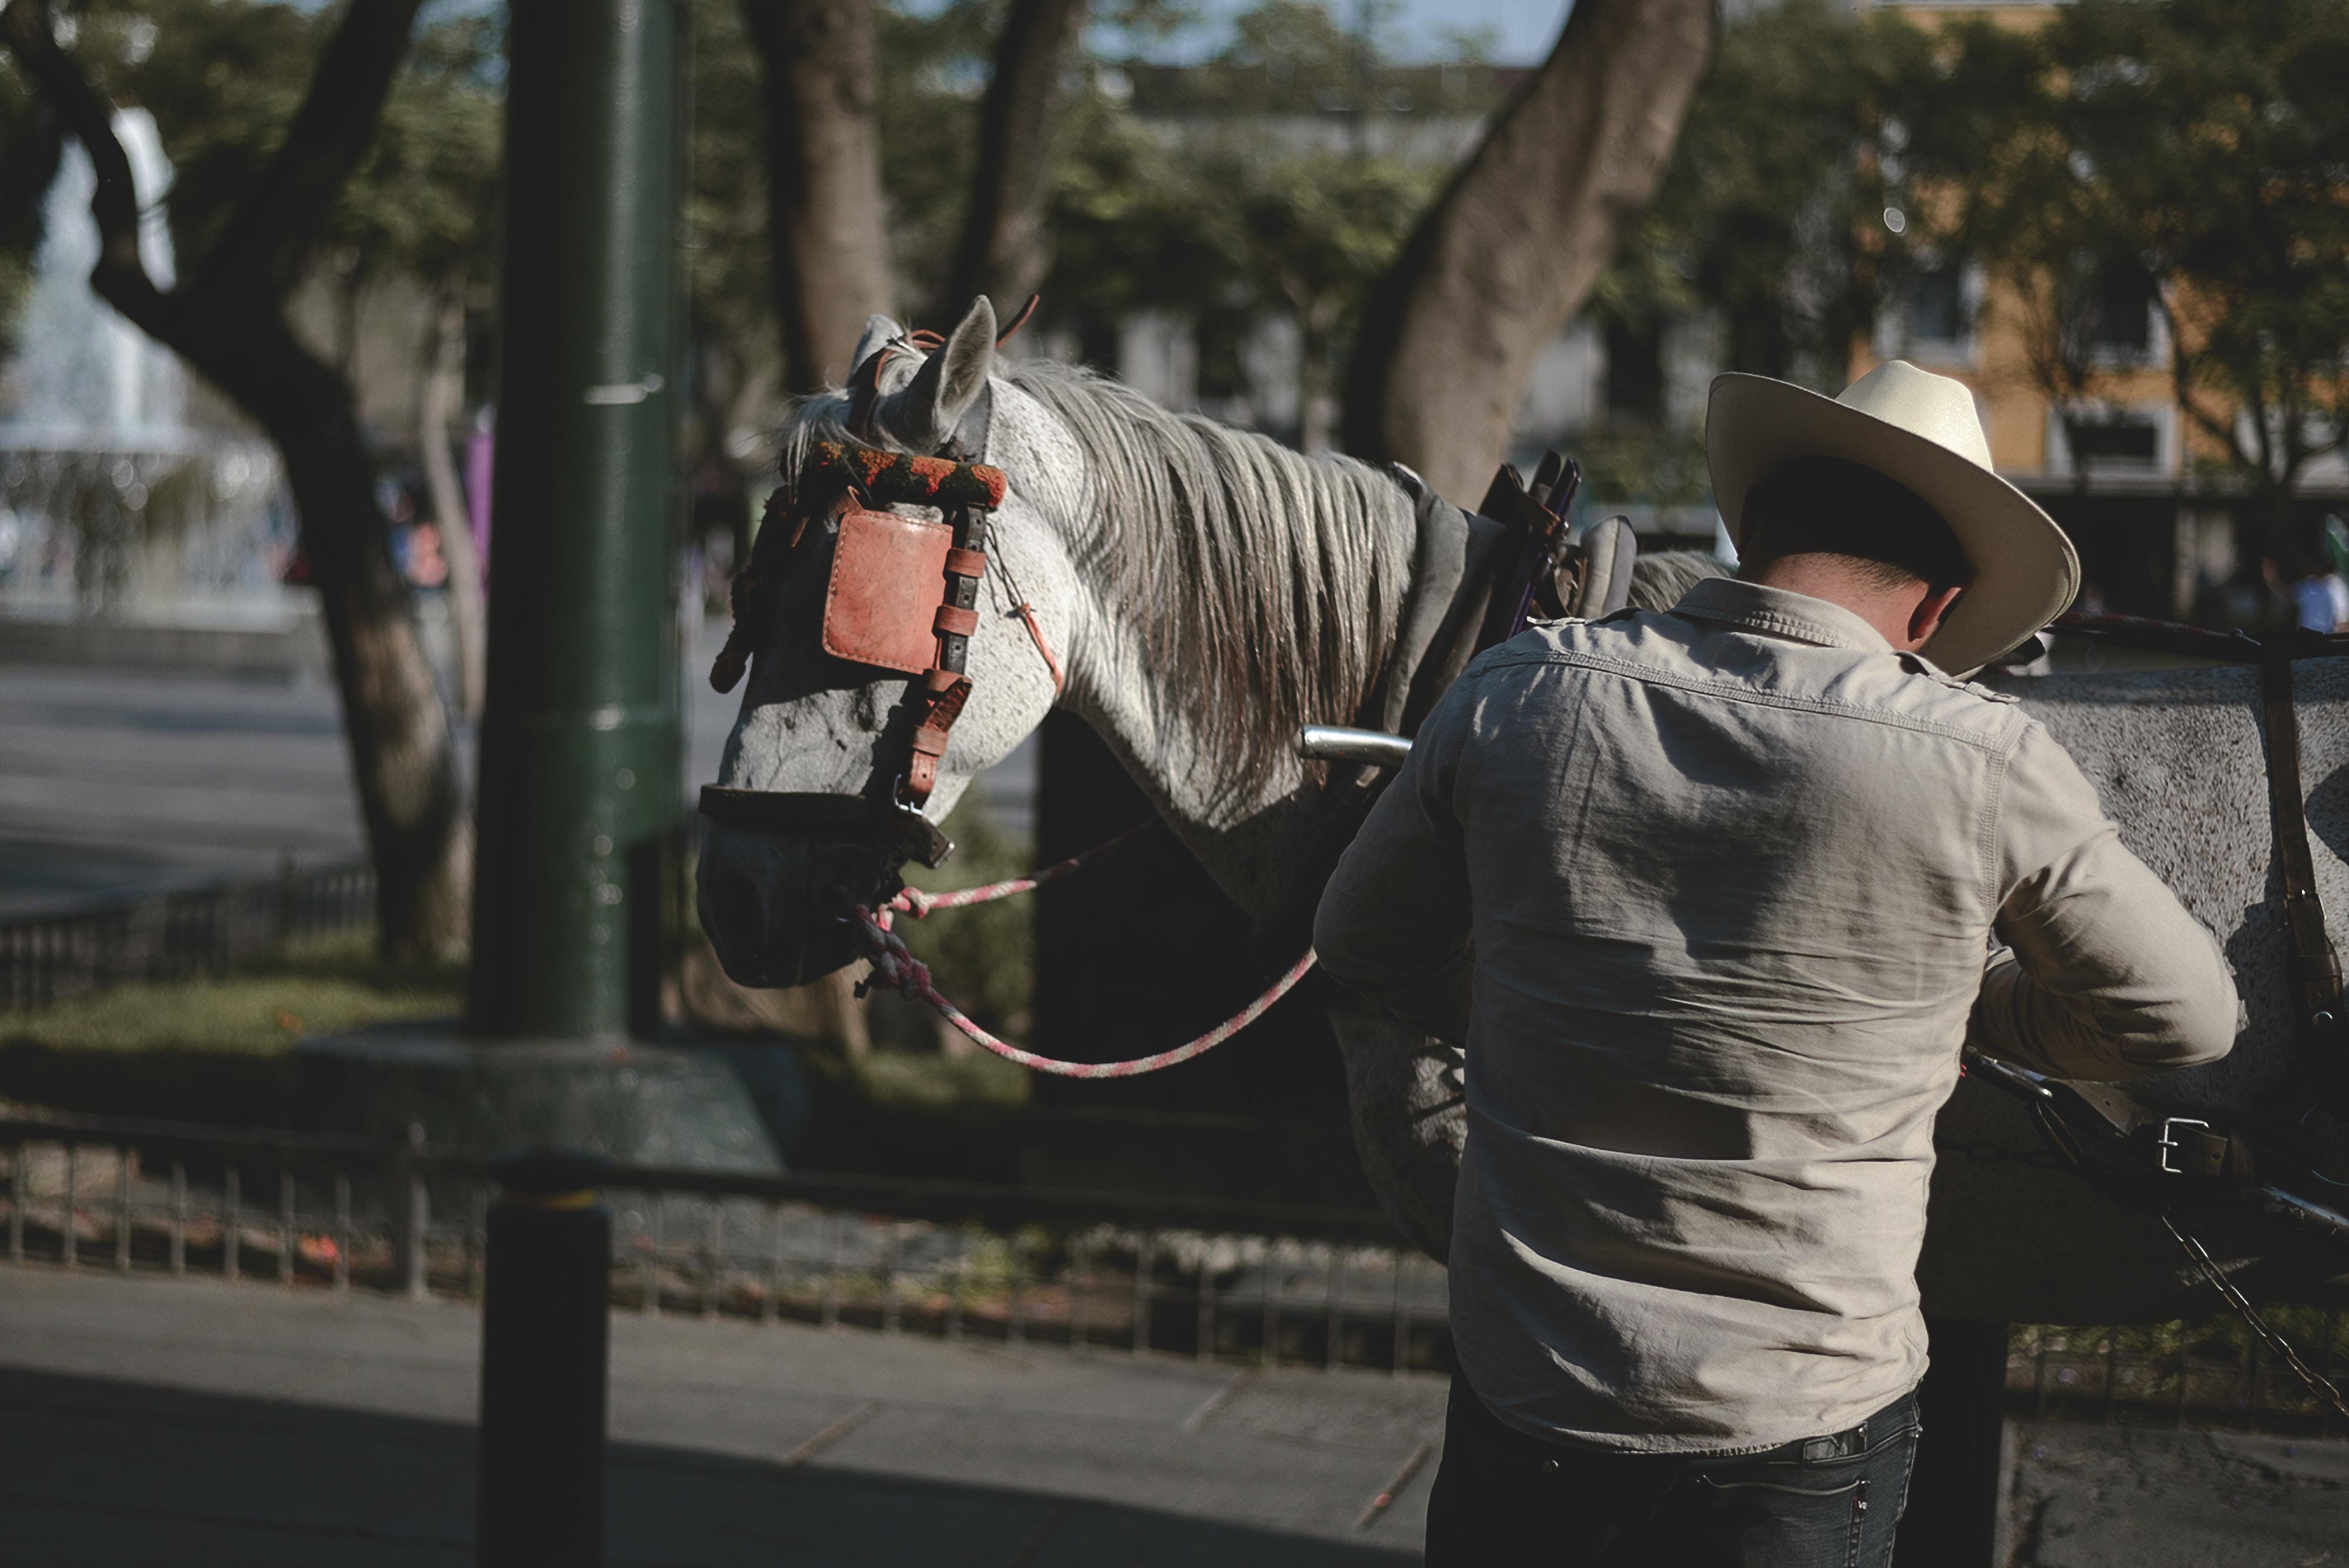 man wearing white dress shirt beside horse